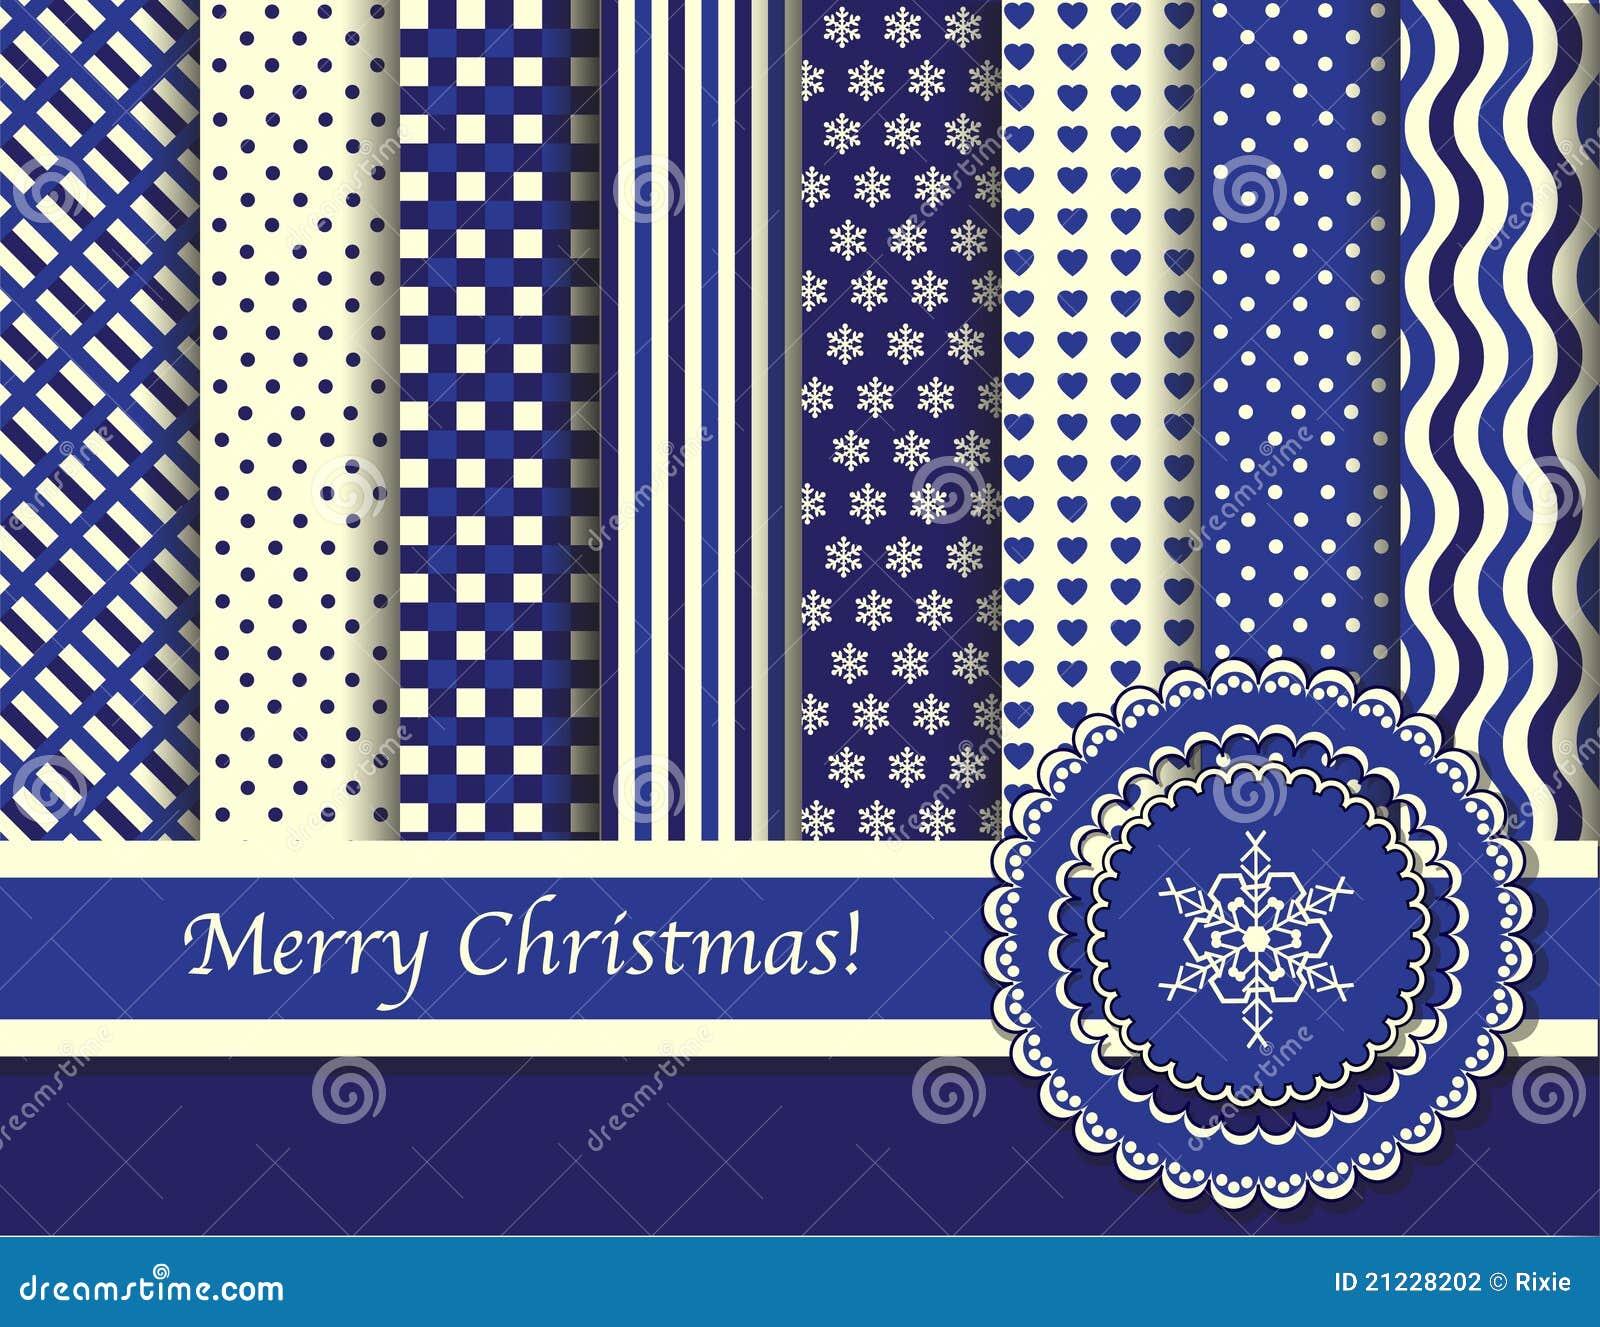 Blue Christmas Scrapbook Paper Christmas scrapbooking blue